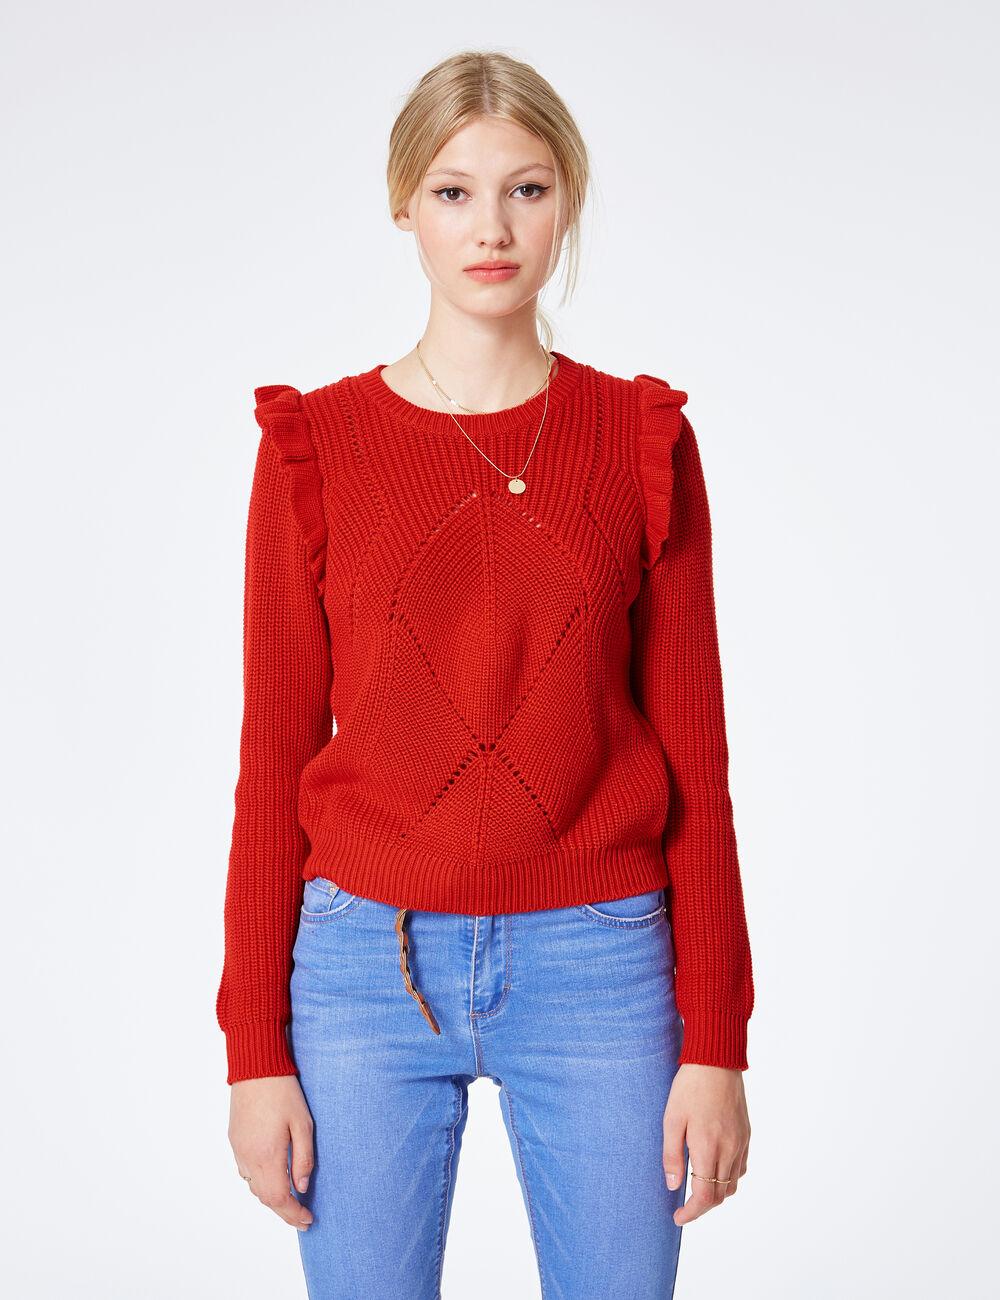 Pull over rouge femme La Redoute Retrouvez tous les articles Pull over rouge femme sur La Redoute. Dcouvrez notre slection: rayures, en tricot, en laine et cardigans. Love Moschino - Pull Gilet - Pull rouge .